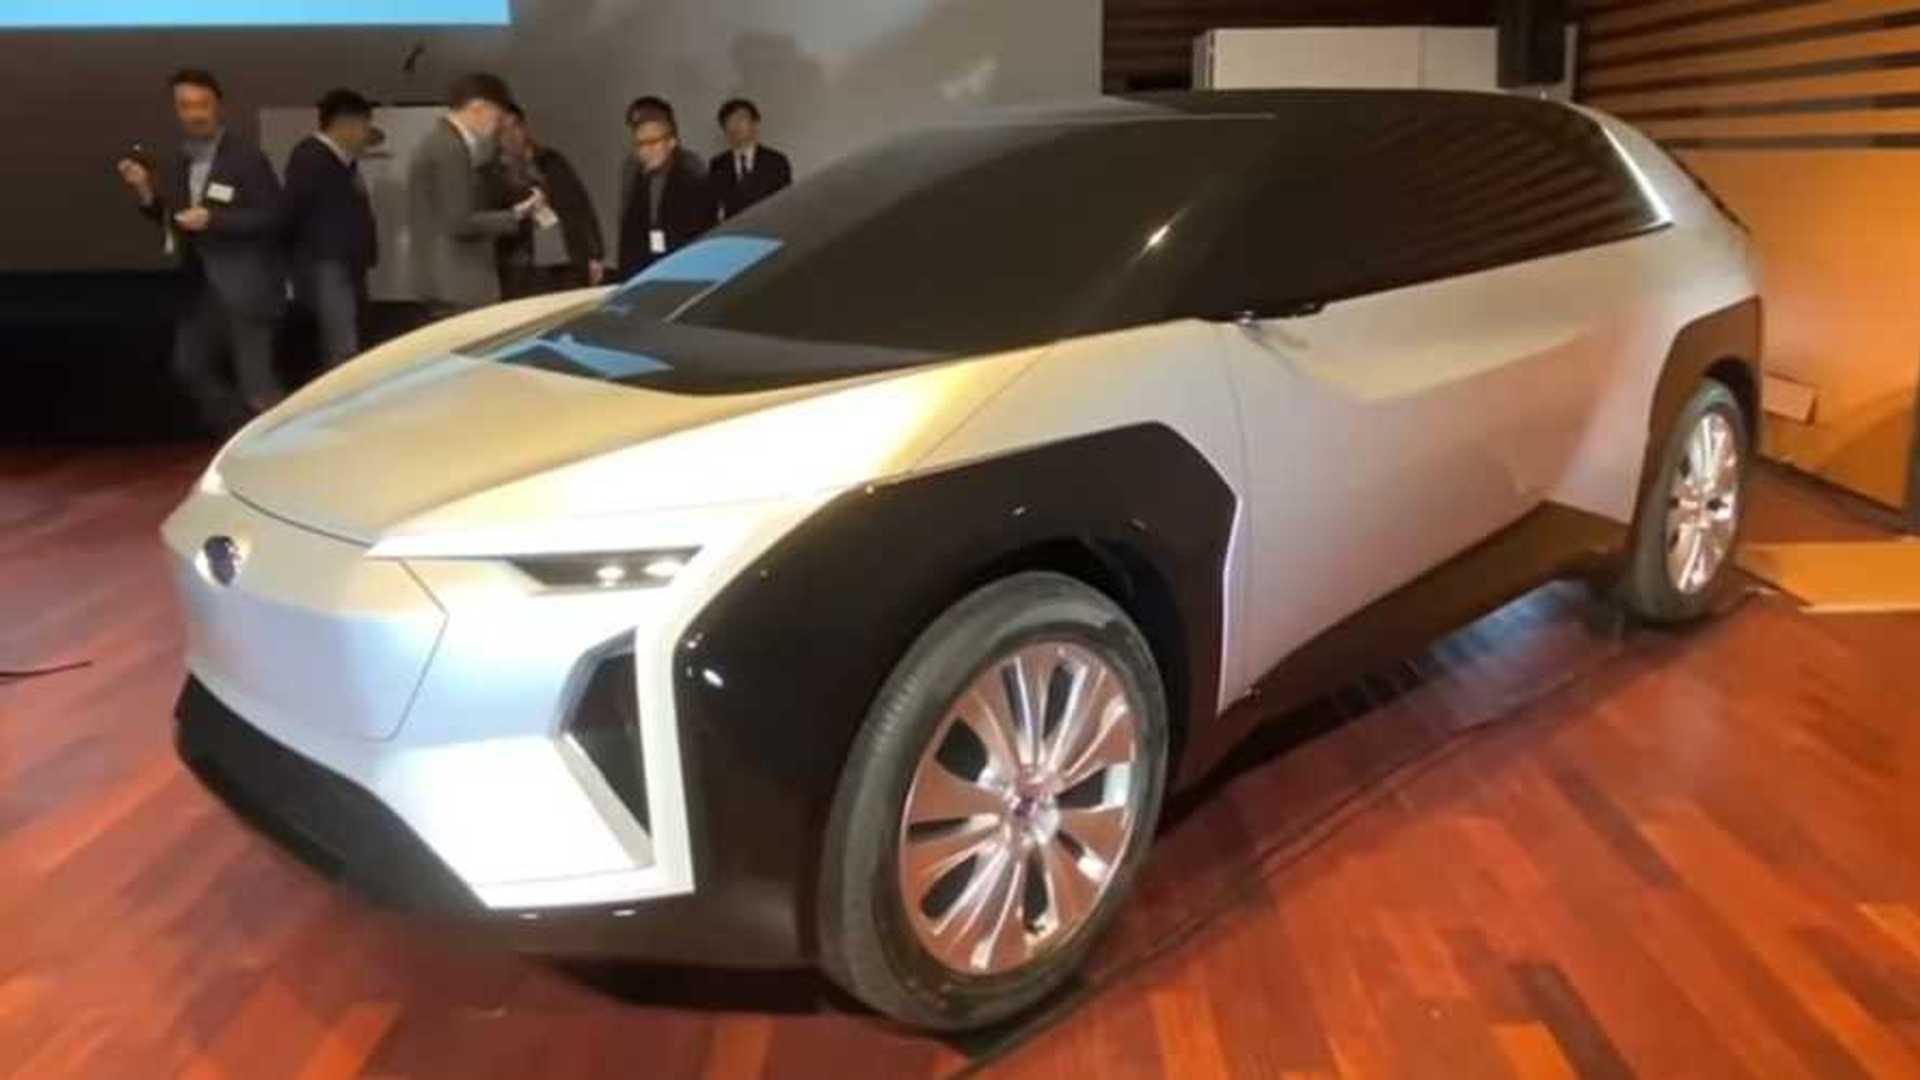 Boldly Designed Subaru Electric Crossover Gets Video Walkaround